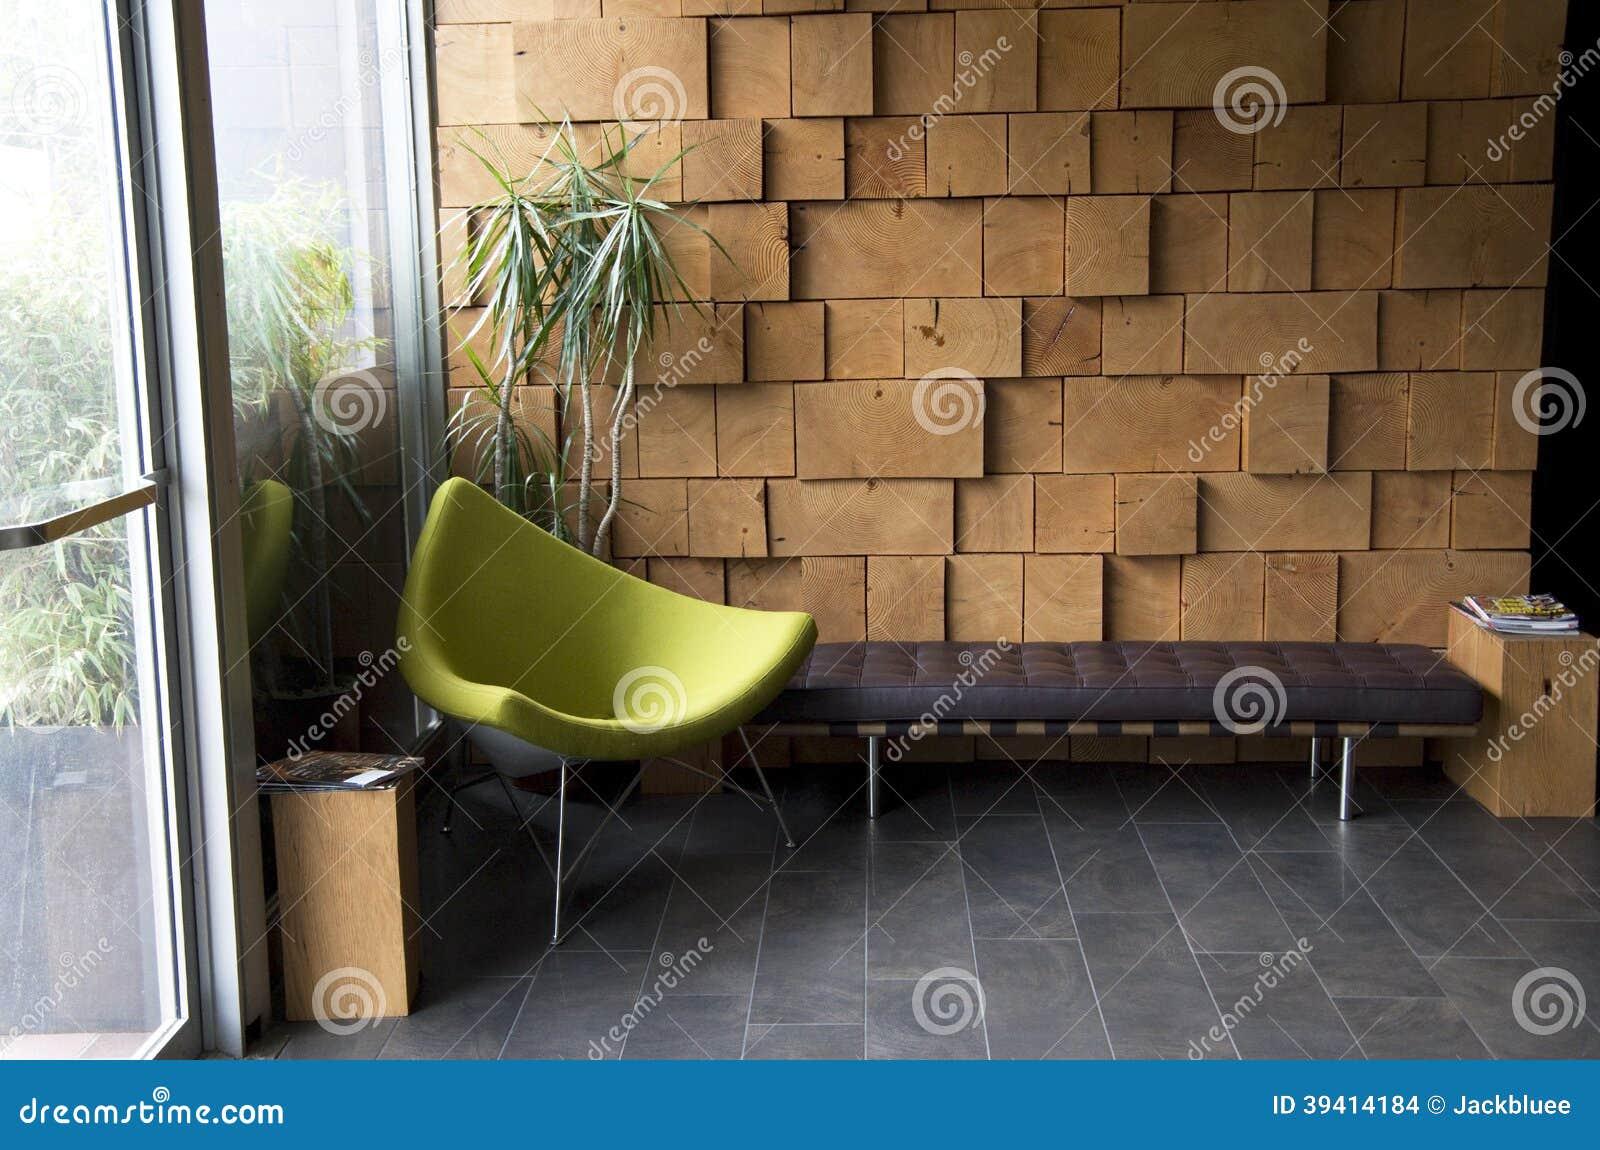 Fancy office interiors